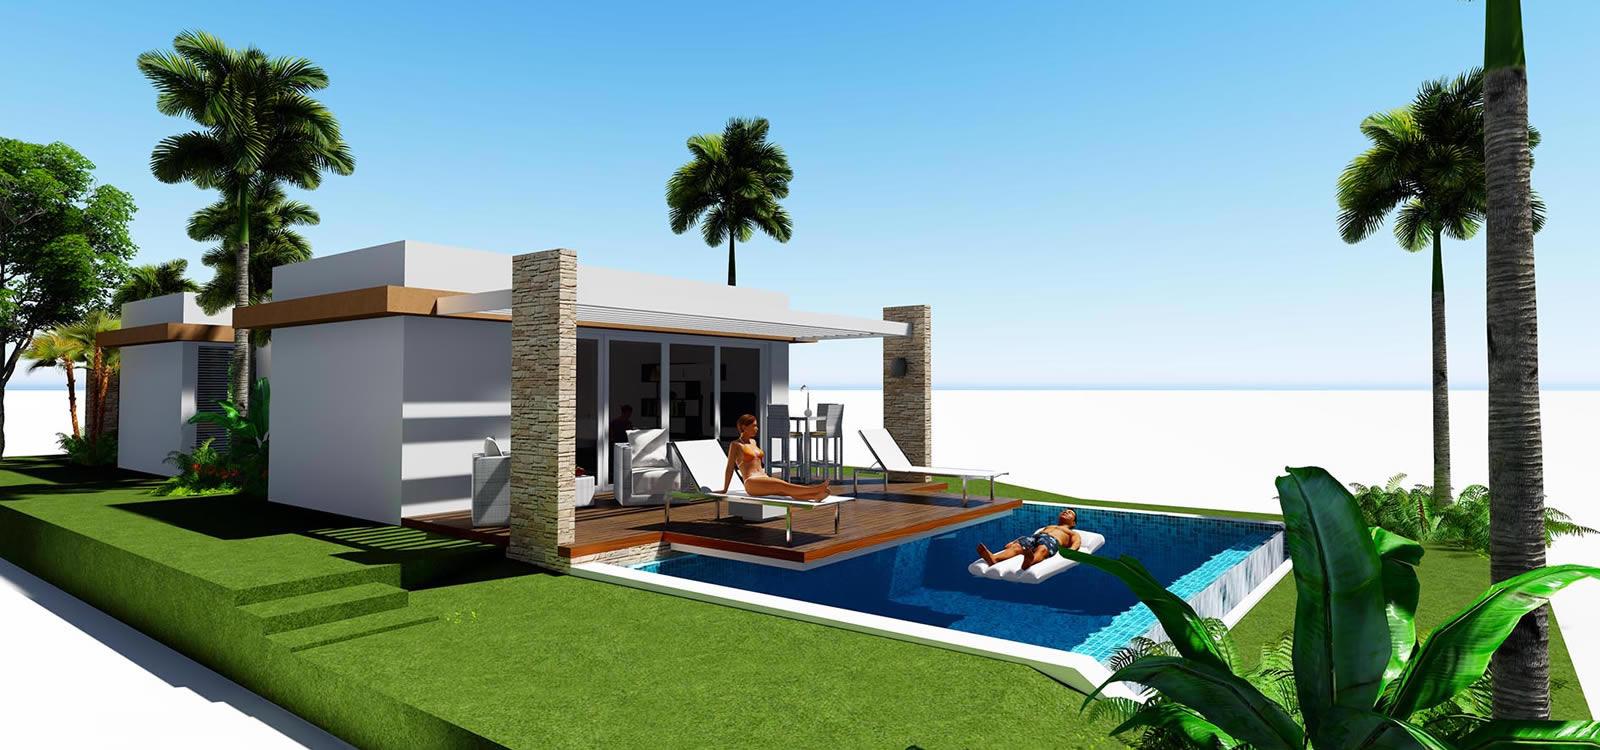 1 Bedroom Villas For In Beach Resort Bayahibe Dominican Republic 7th Heaven Properties